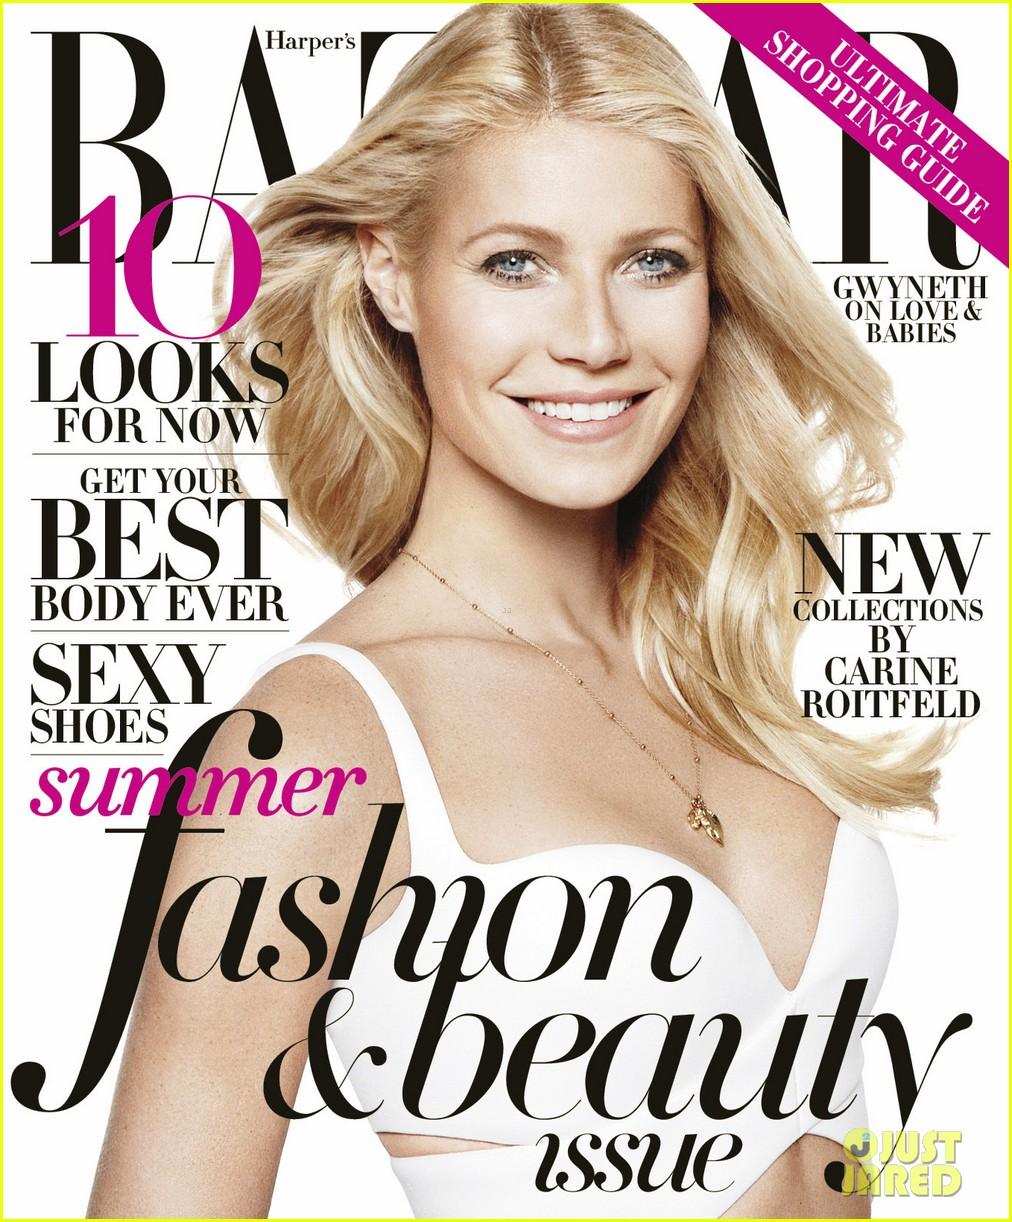 gwyneth paltrow covers harpers bazaar may 2013 012847680